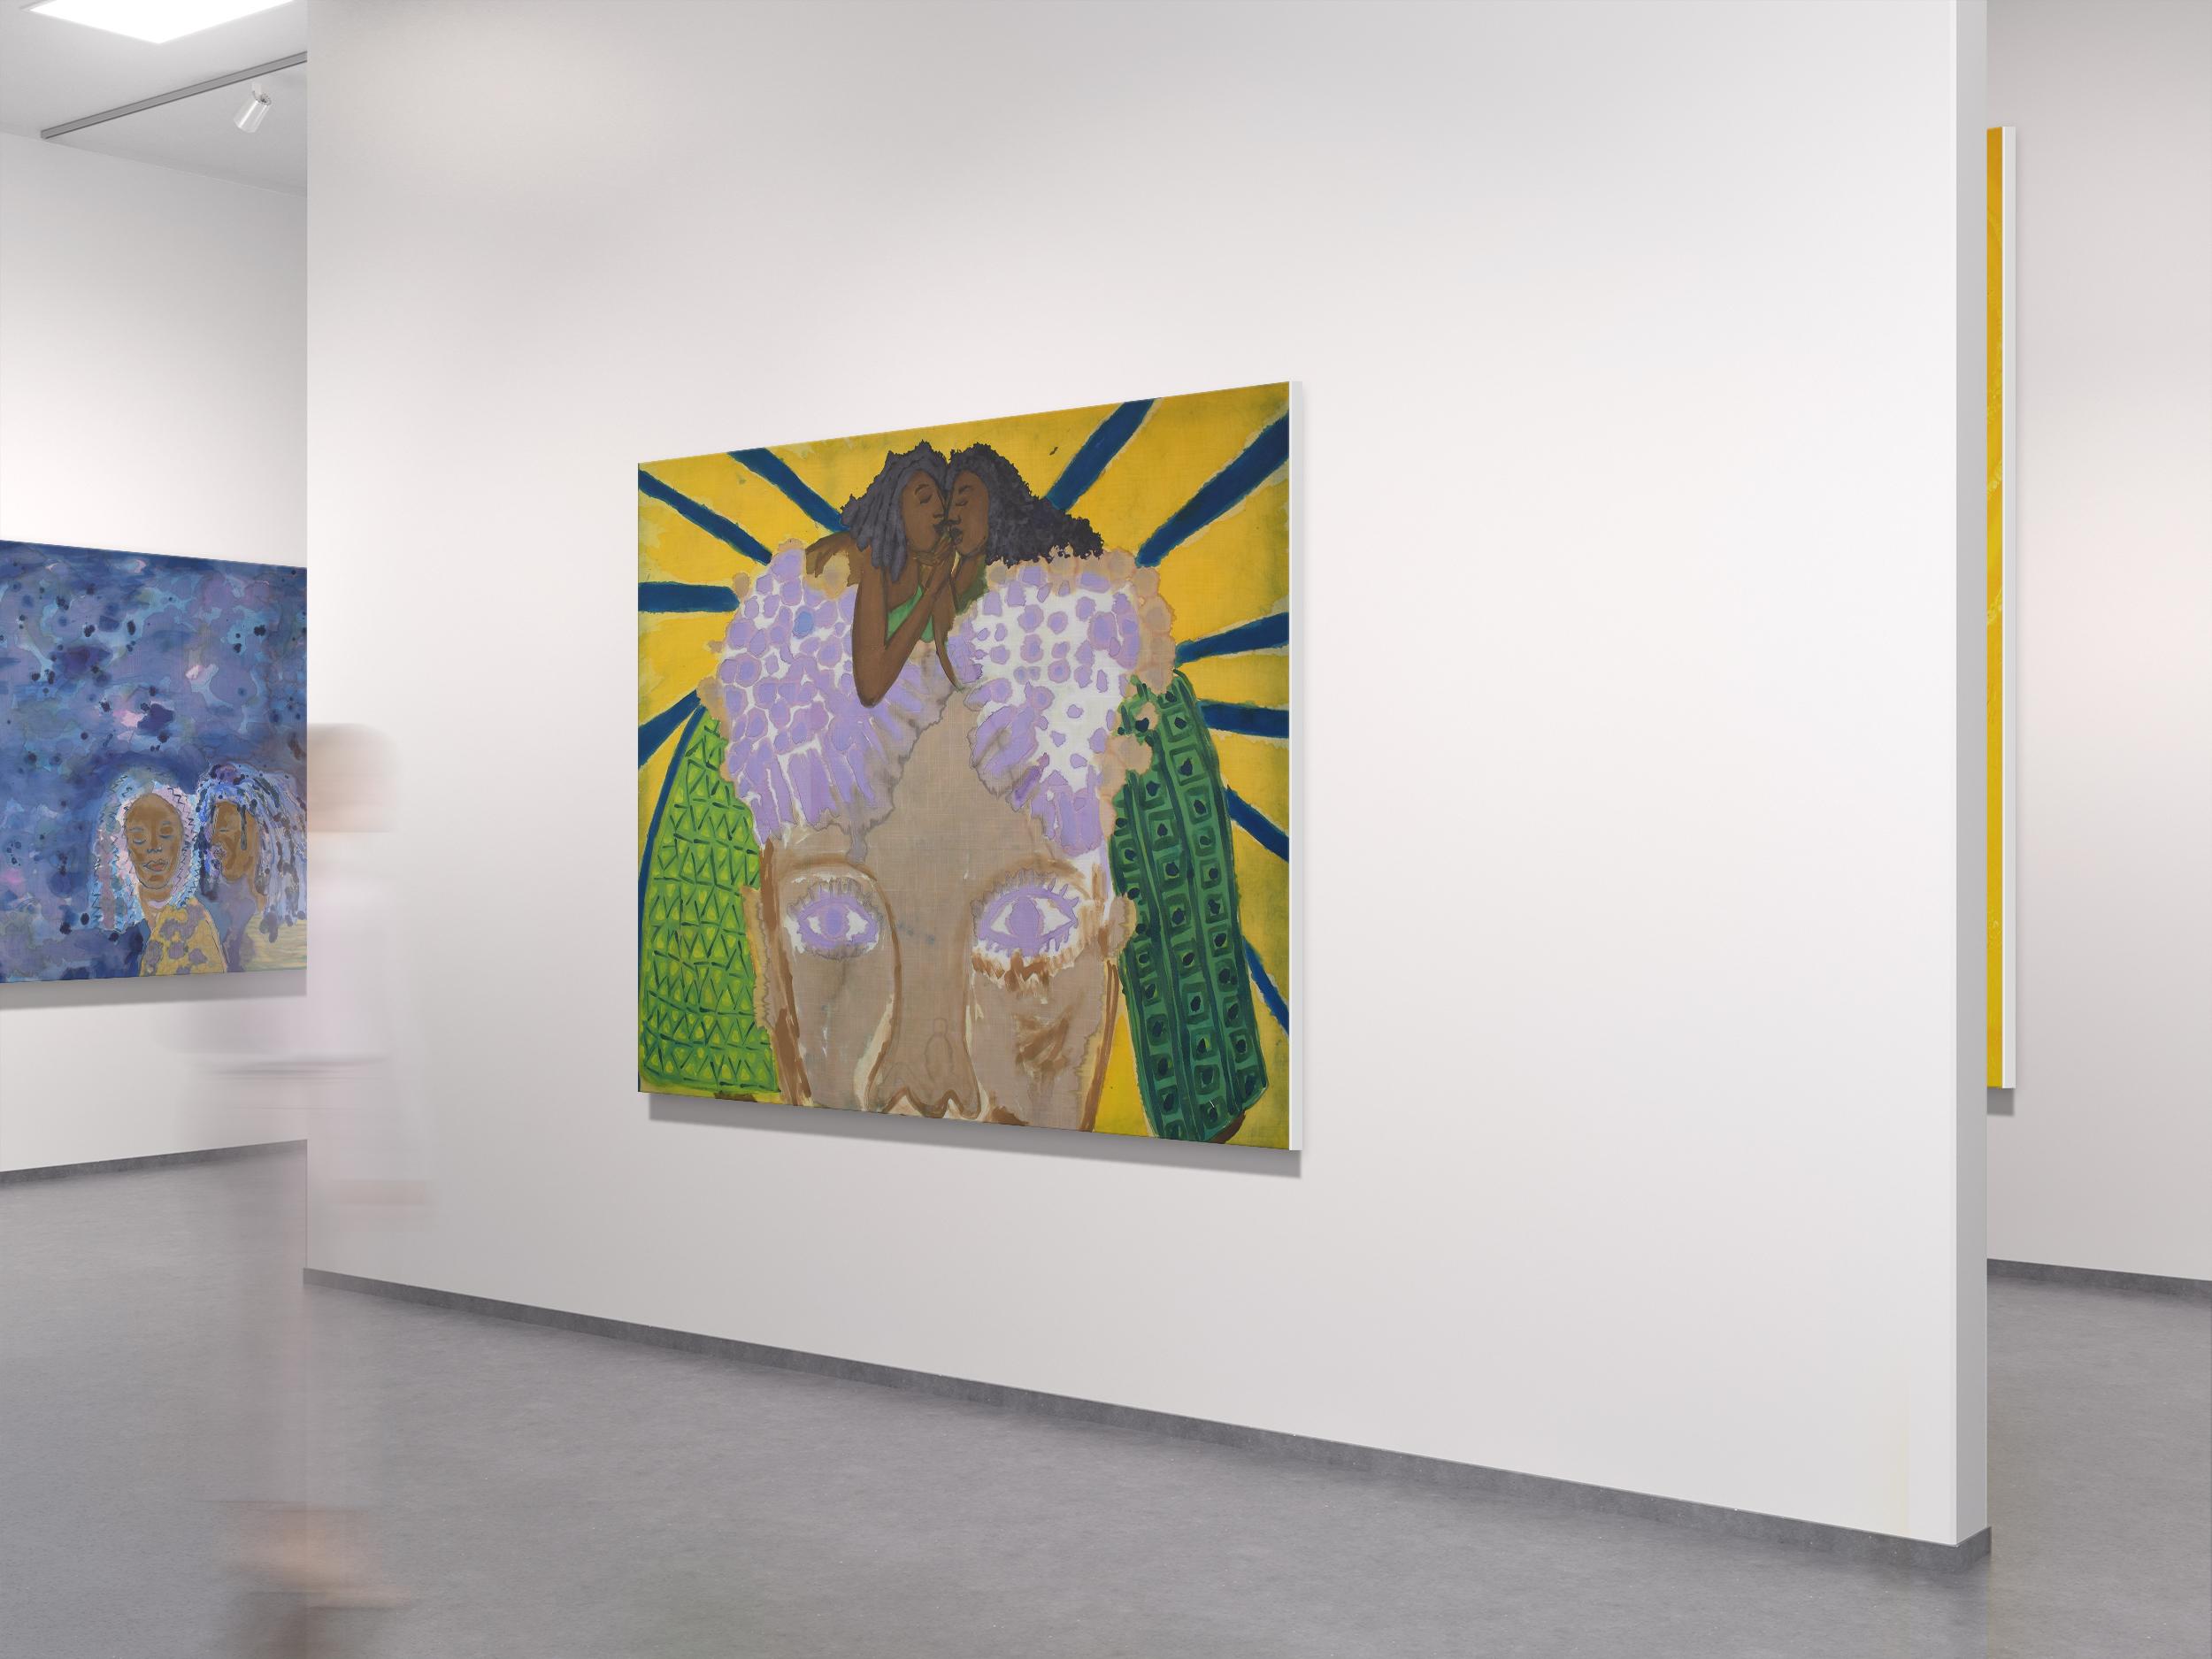 8_Sola_Olulode Gallery_diagonal_2500x1875px